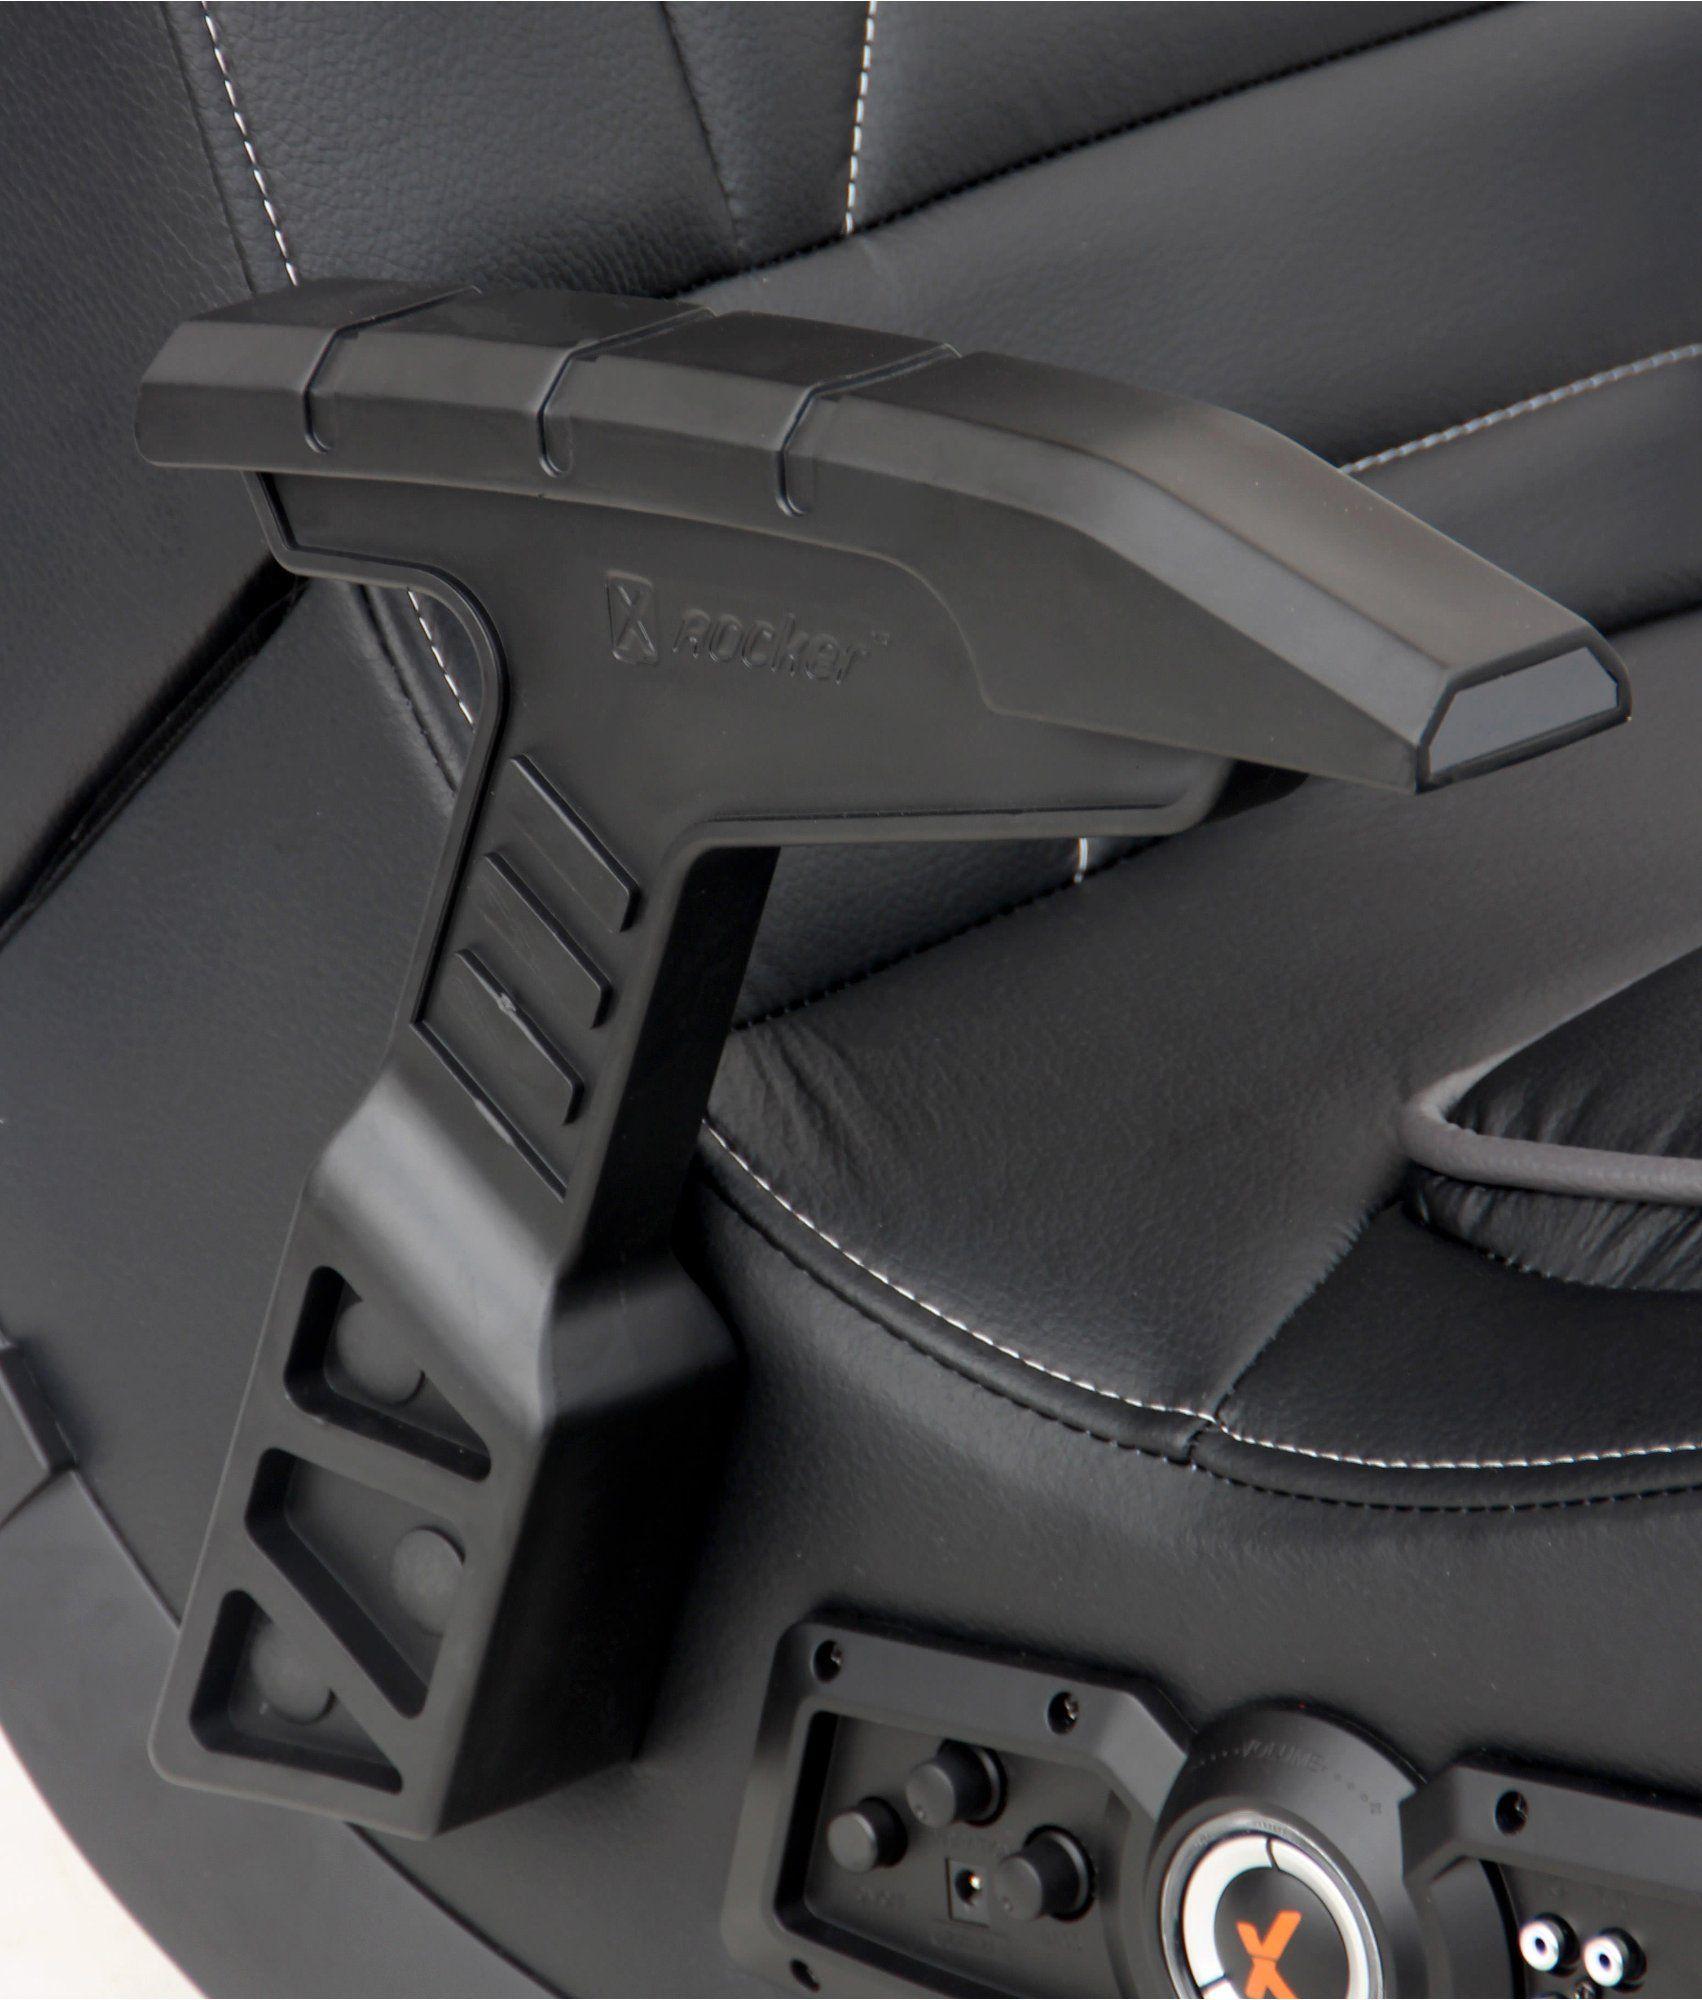 X Rocker Pro Series H3 Wireless 4.1 Audio with Vibration